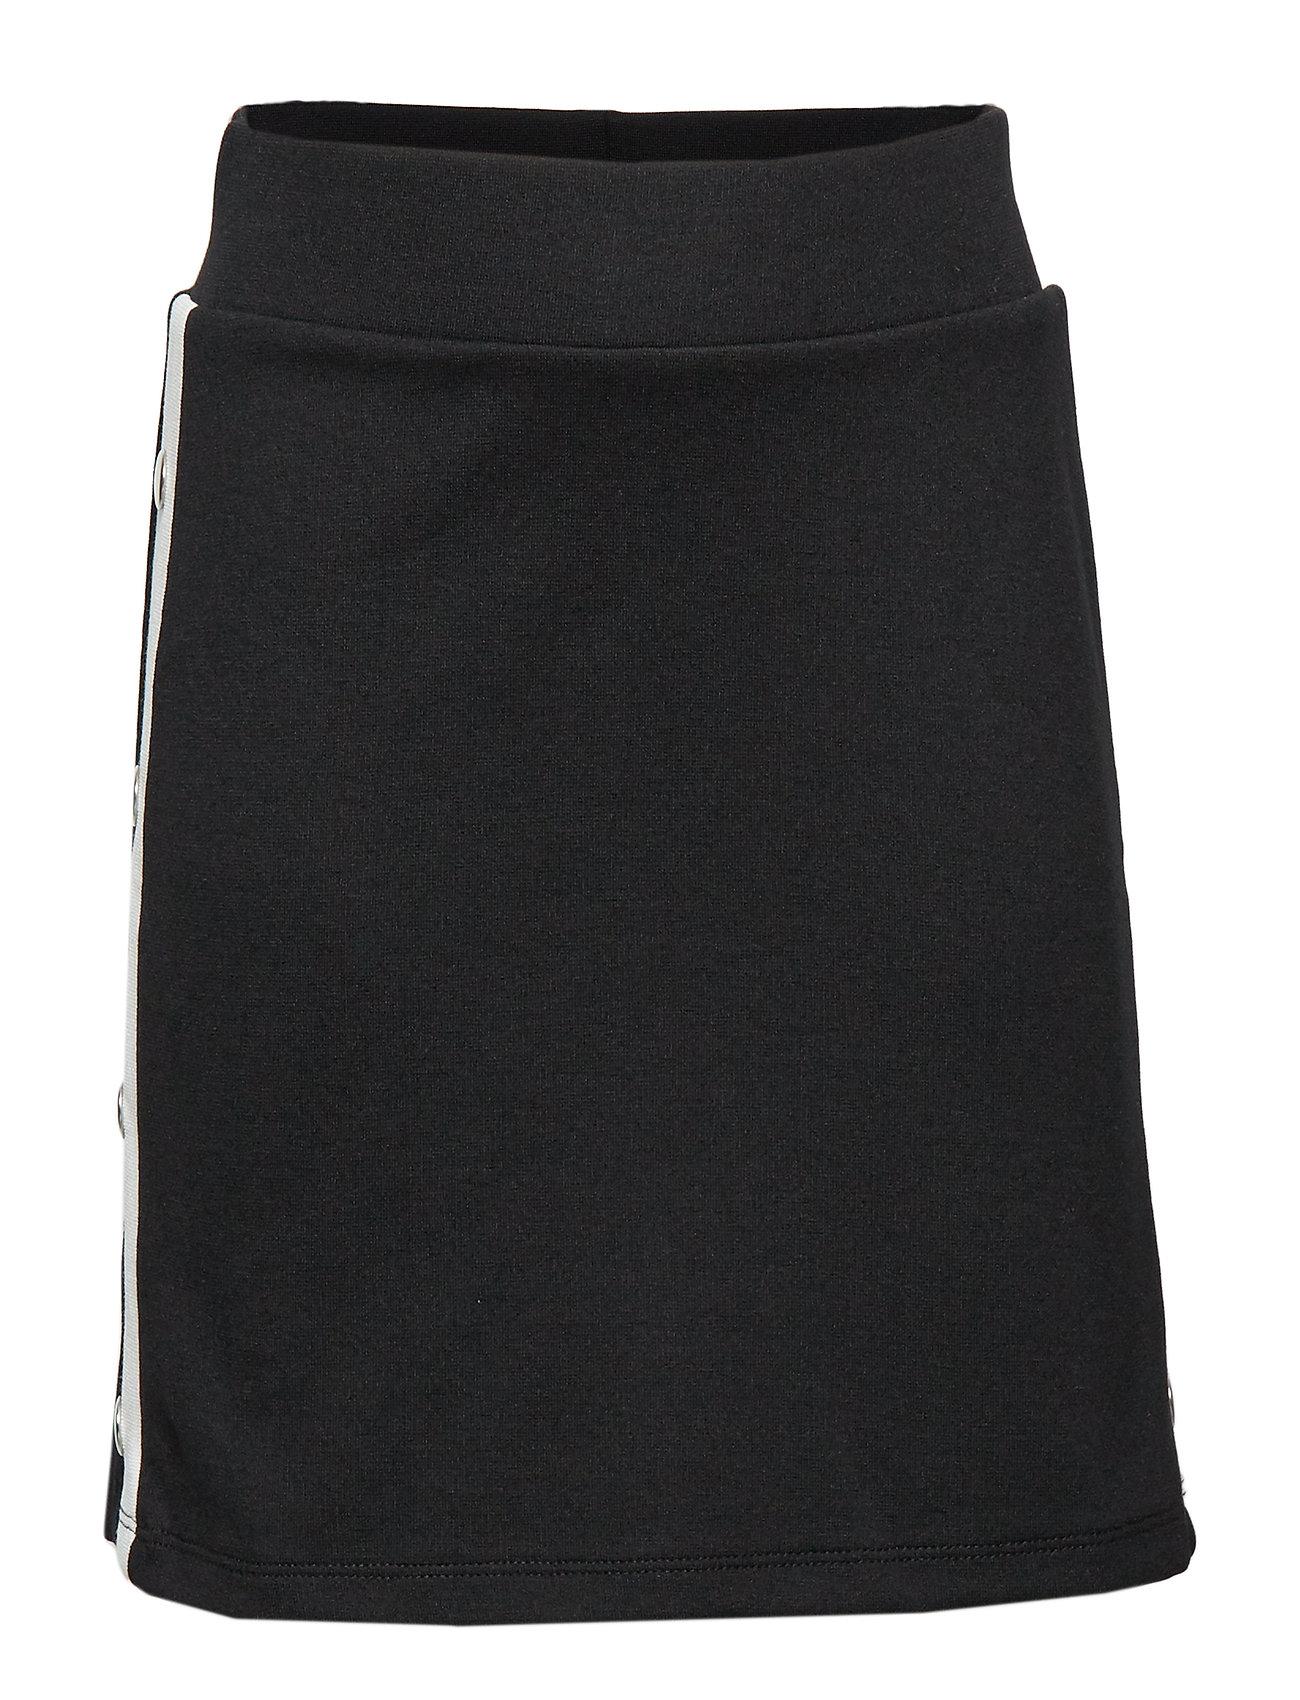 Lindex Black jersey skirt with white side stripes - BLACK